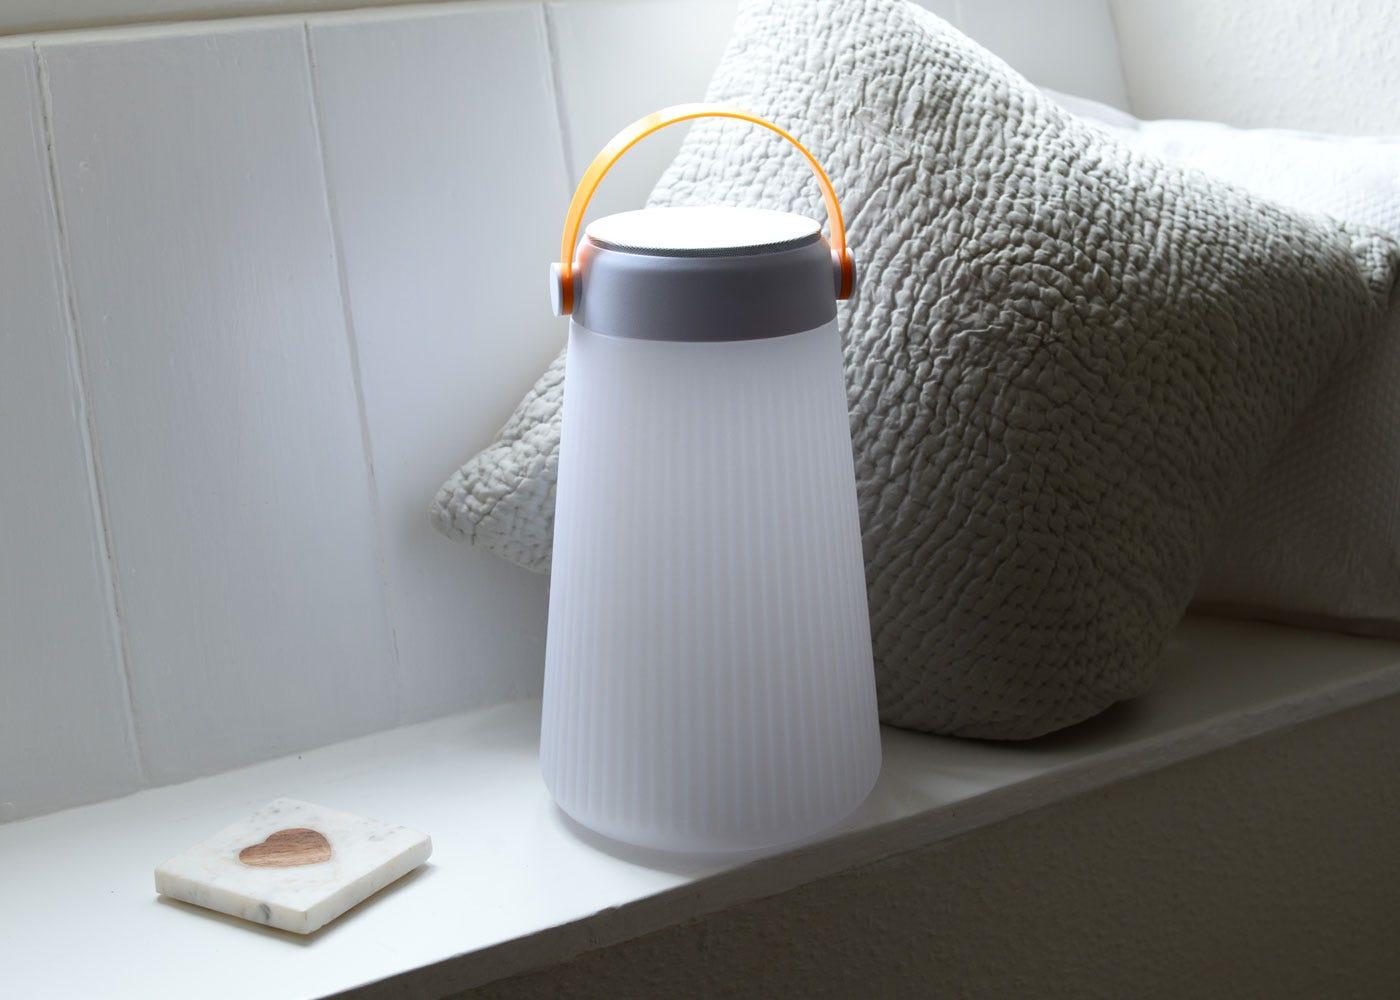 As shown: Lets Go Portable Speaker Lantern - Off.